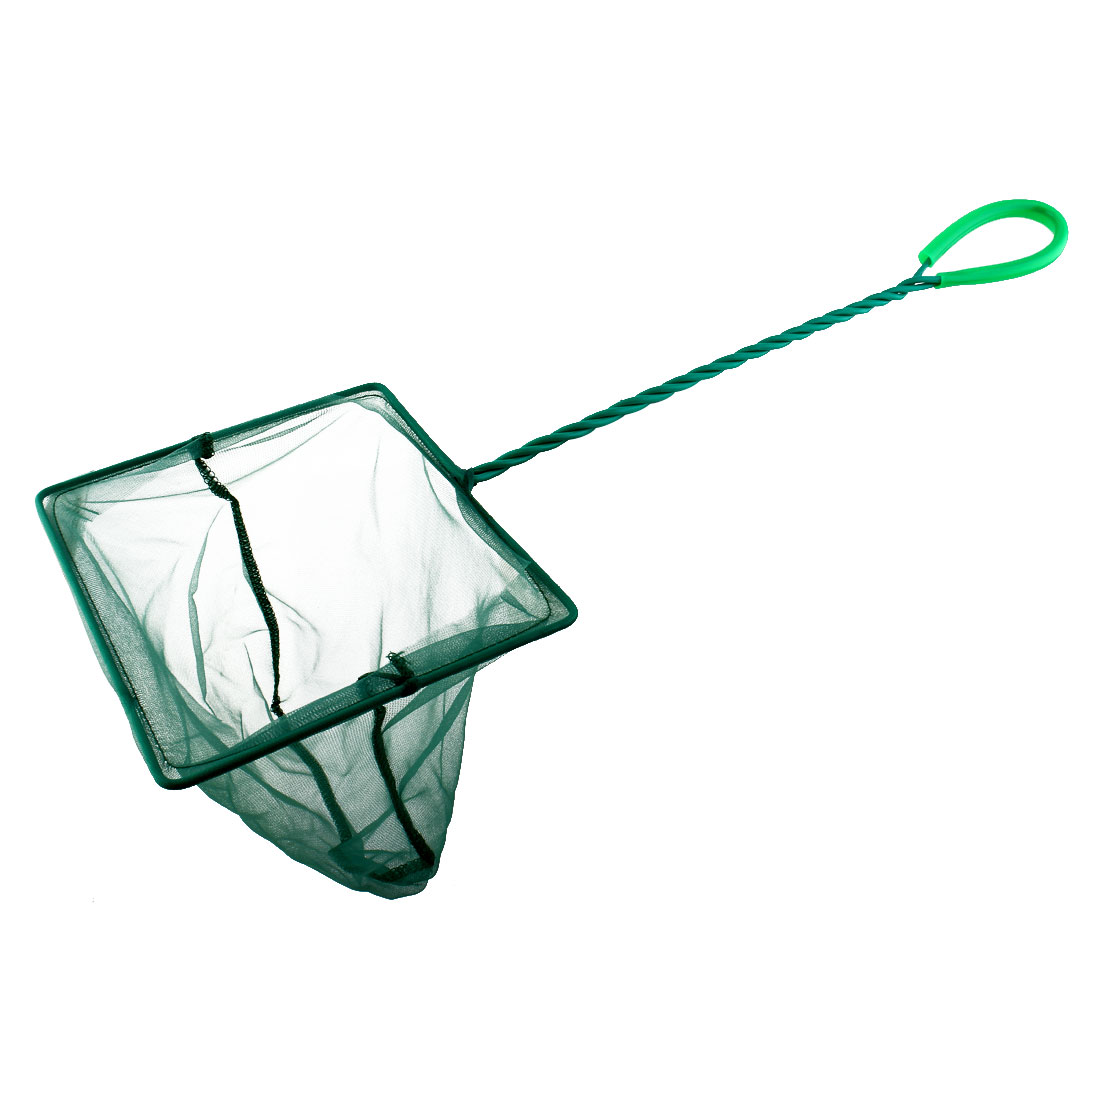 Aquarium Plastic Coated Spiral Handle Square Frame Fish Net Green 7.9inch Wide